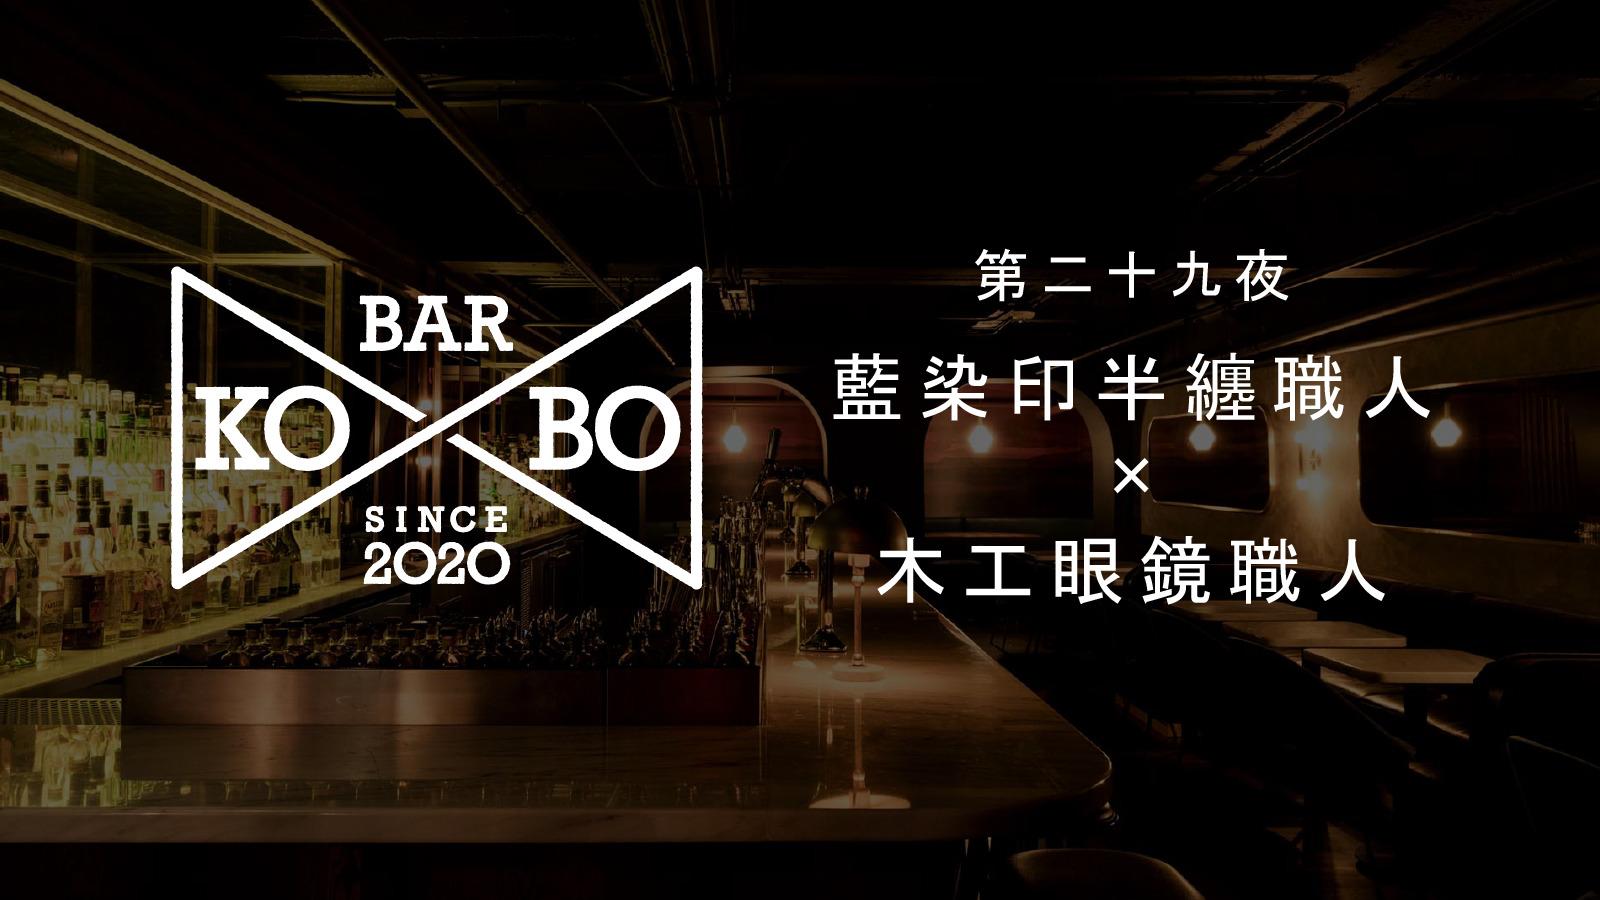 【Bar KO-BO 第二十九夜】藍染印半纏職人×木工眼鏡職人